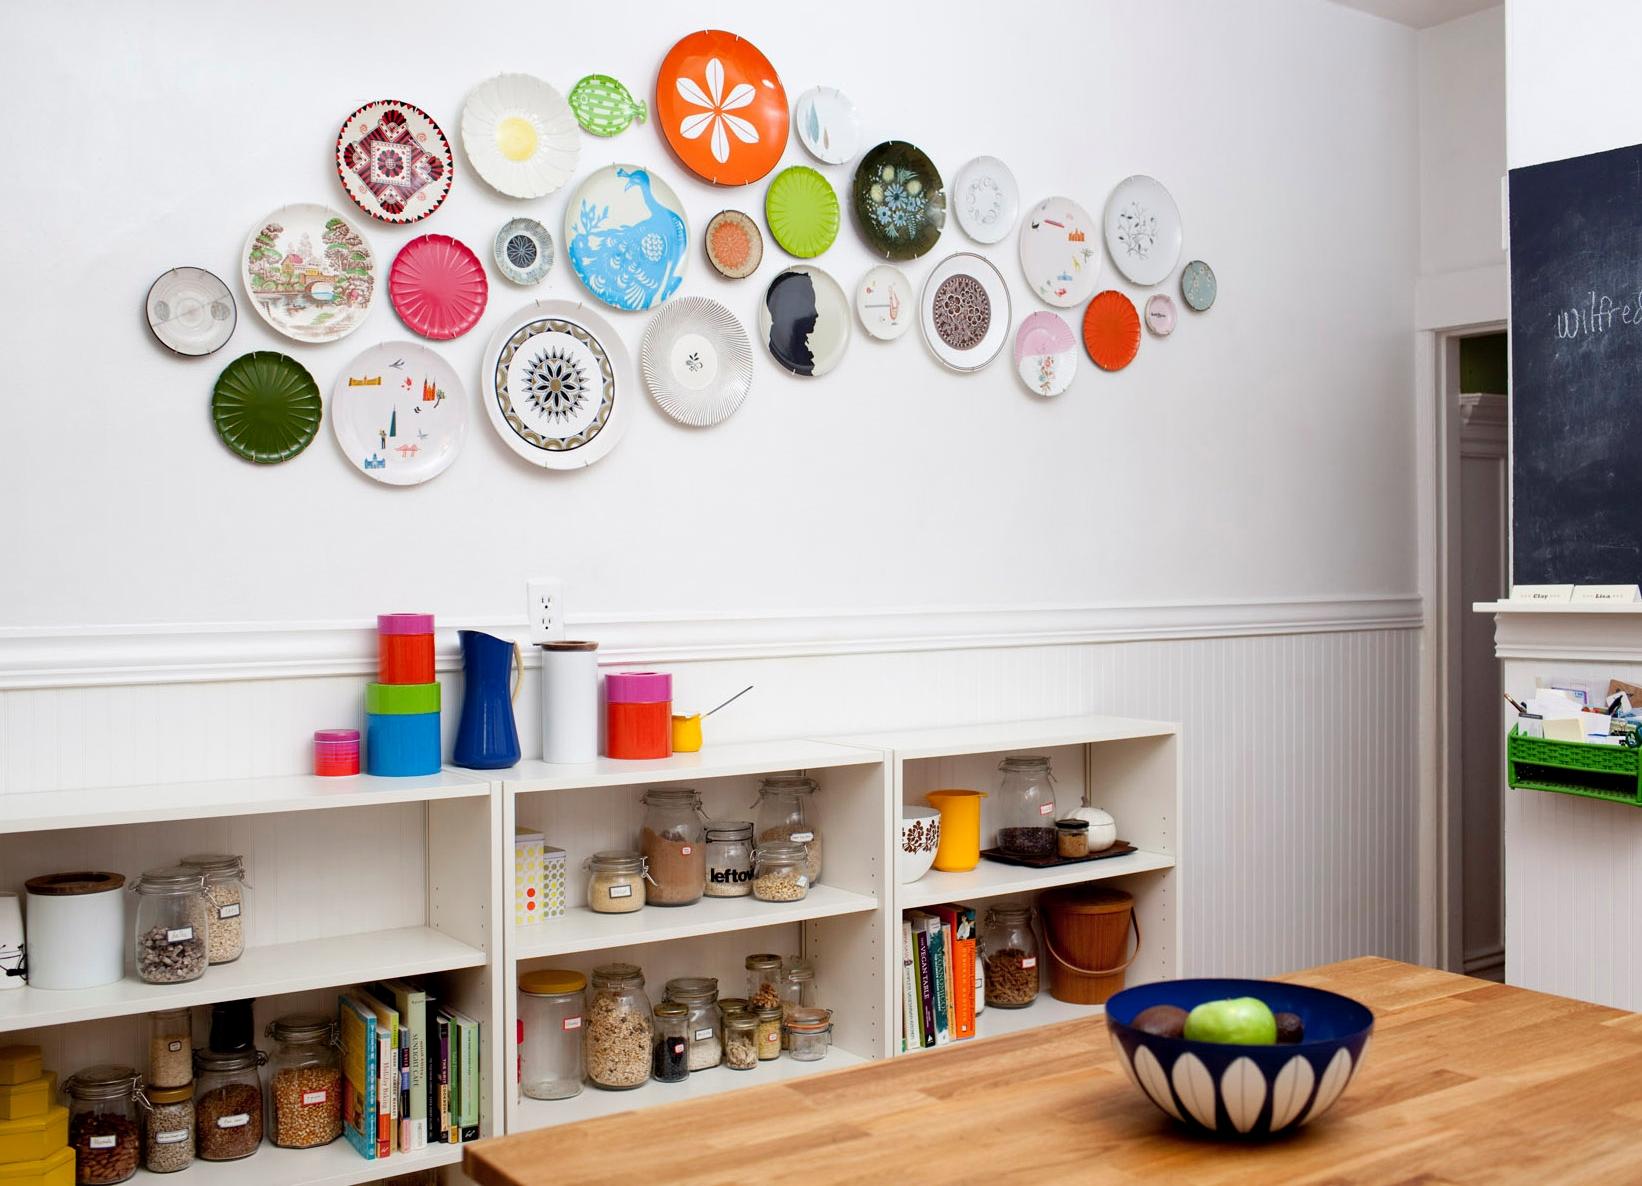 Яркие тарелки на стене в интерьере кухни